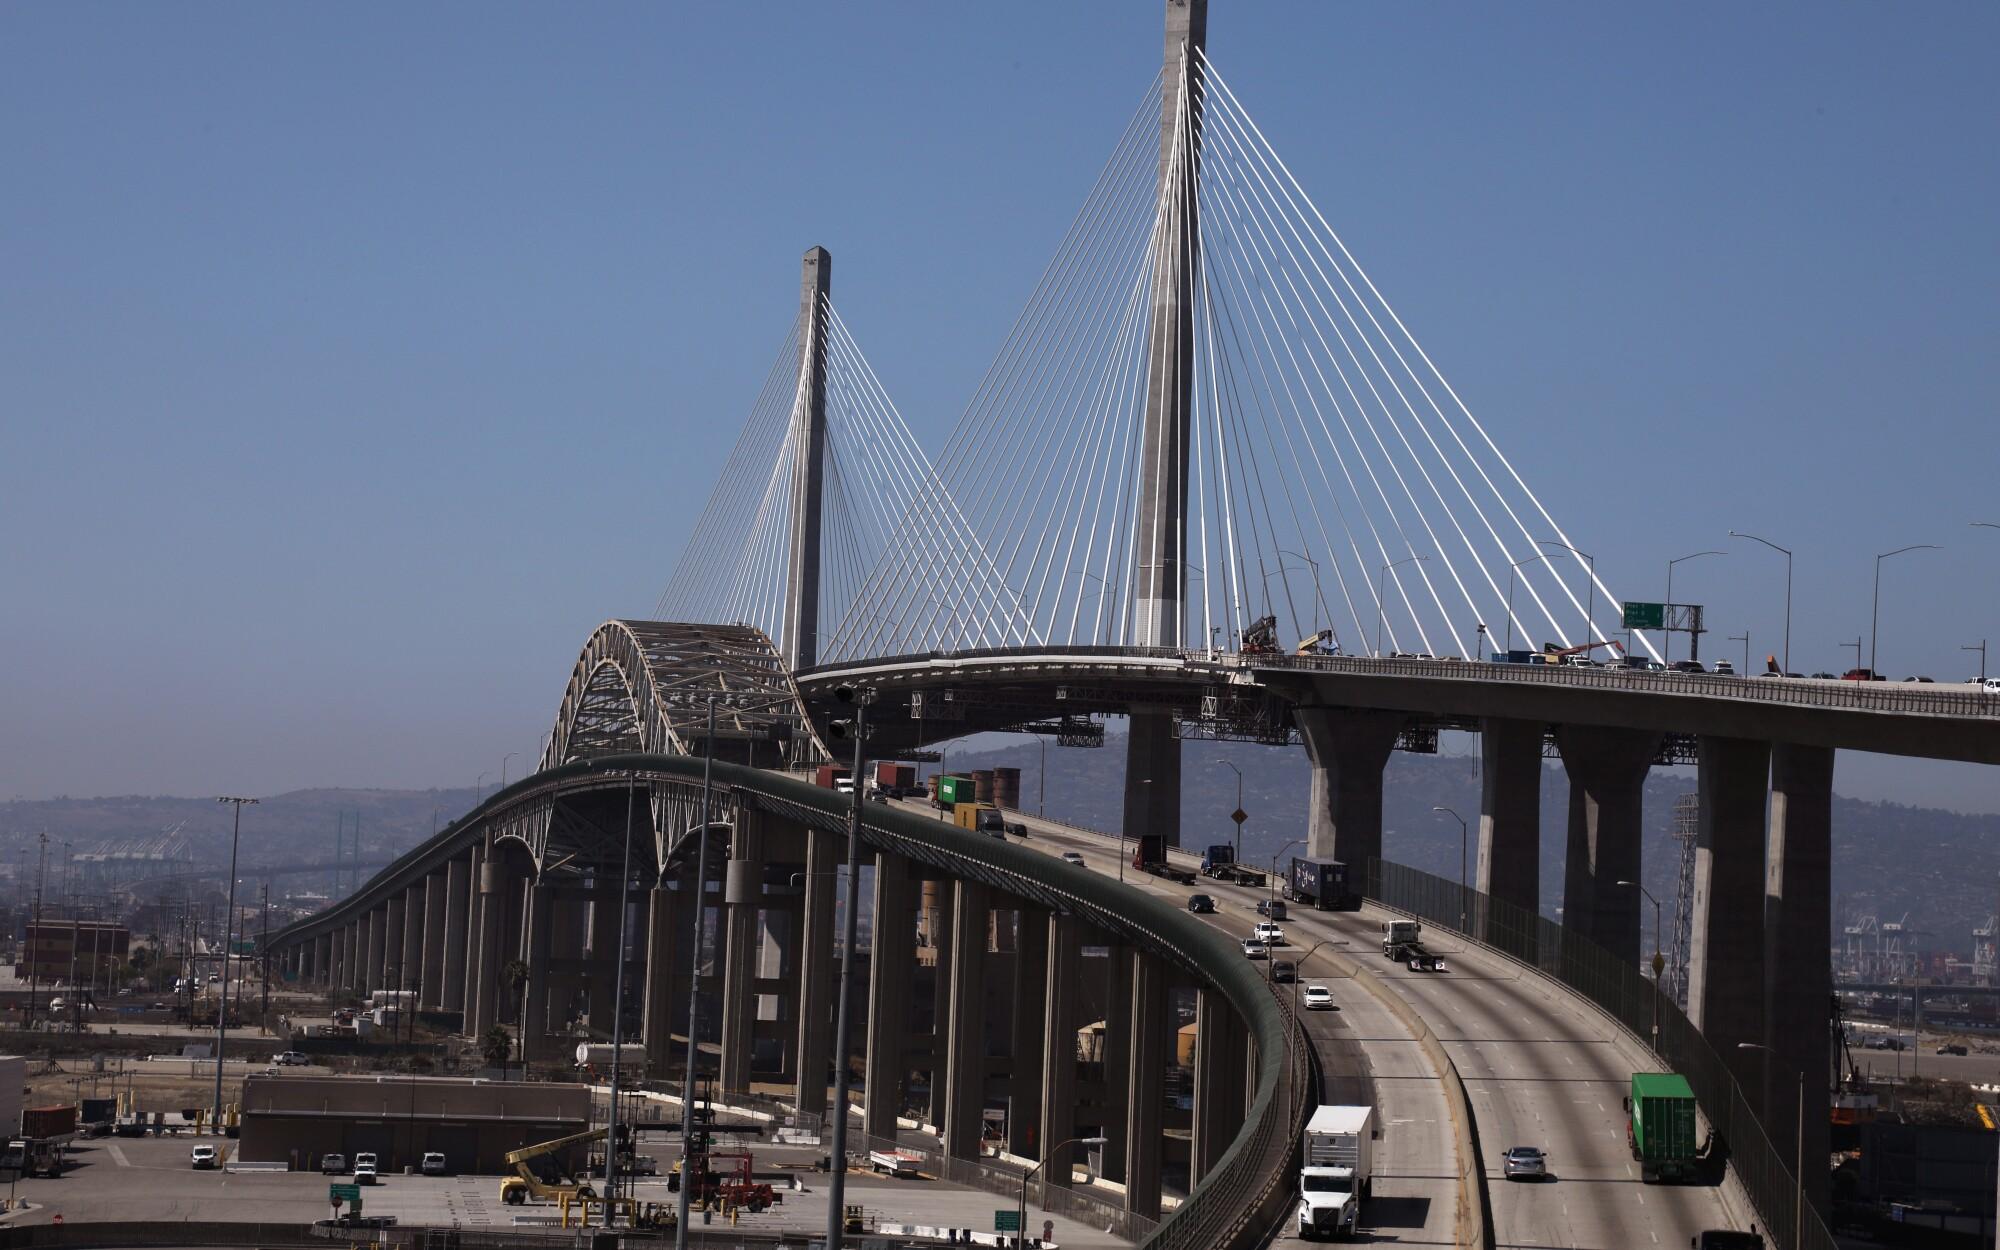 Construction workers work on the Gerald Desmond Bridge